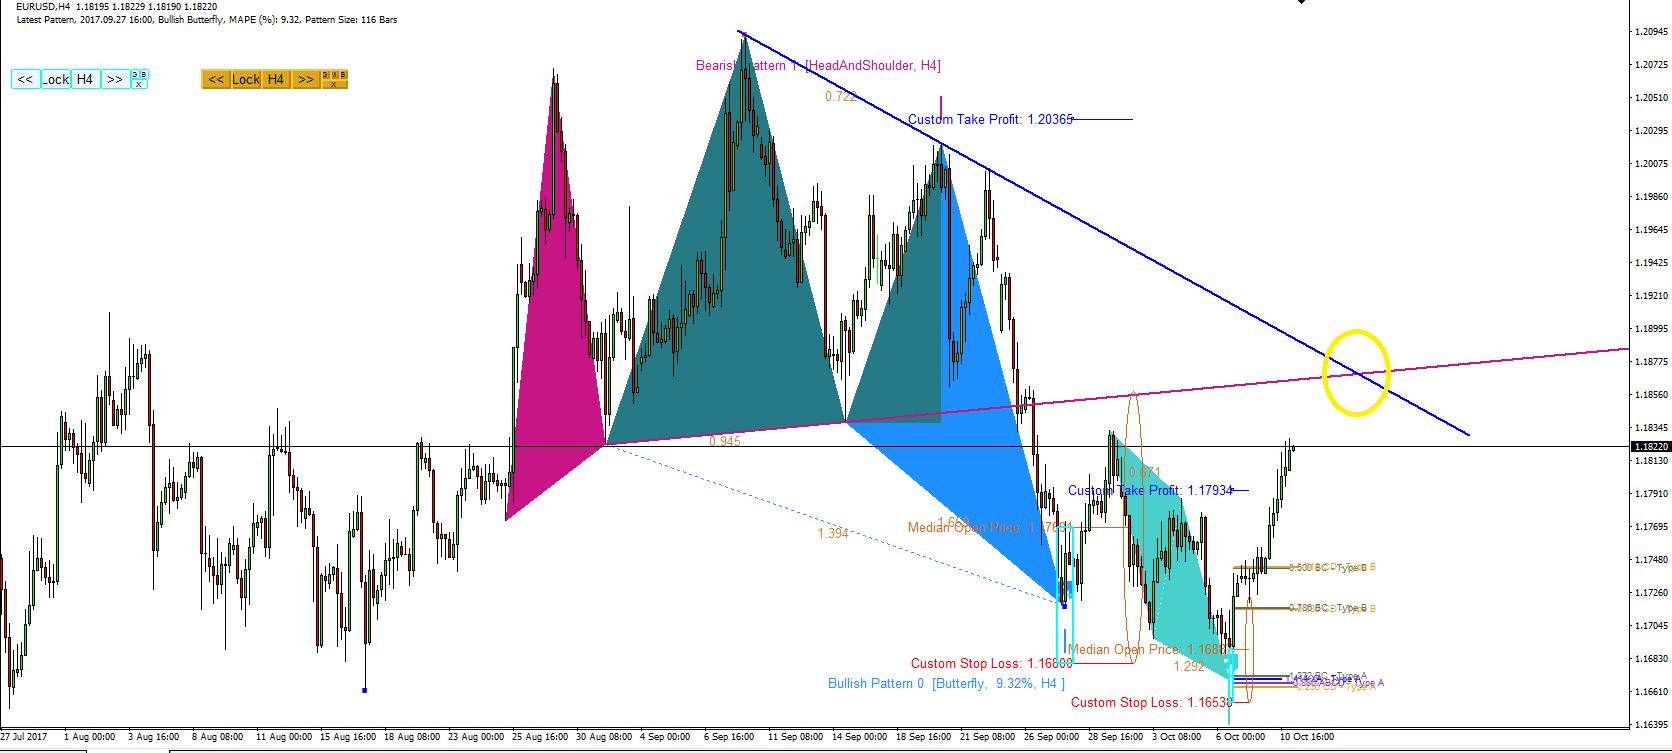 EURUSD Market Outlook